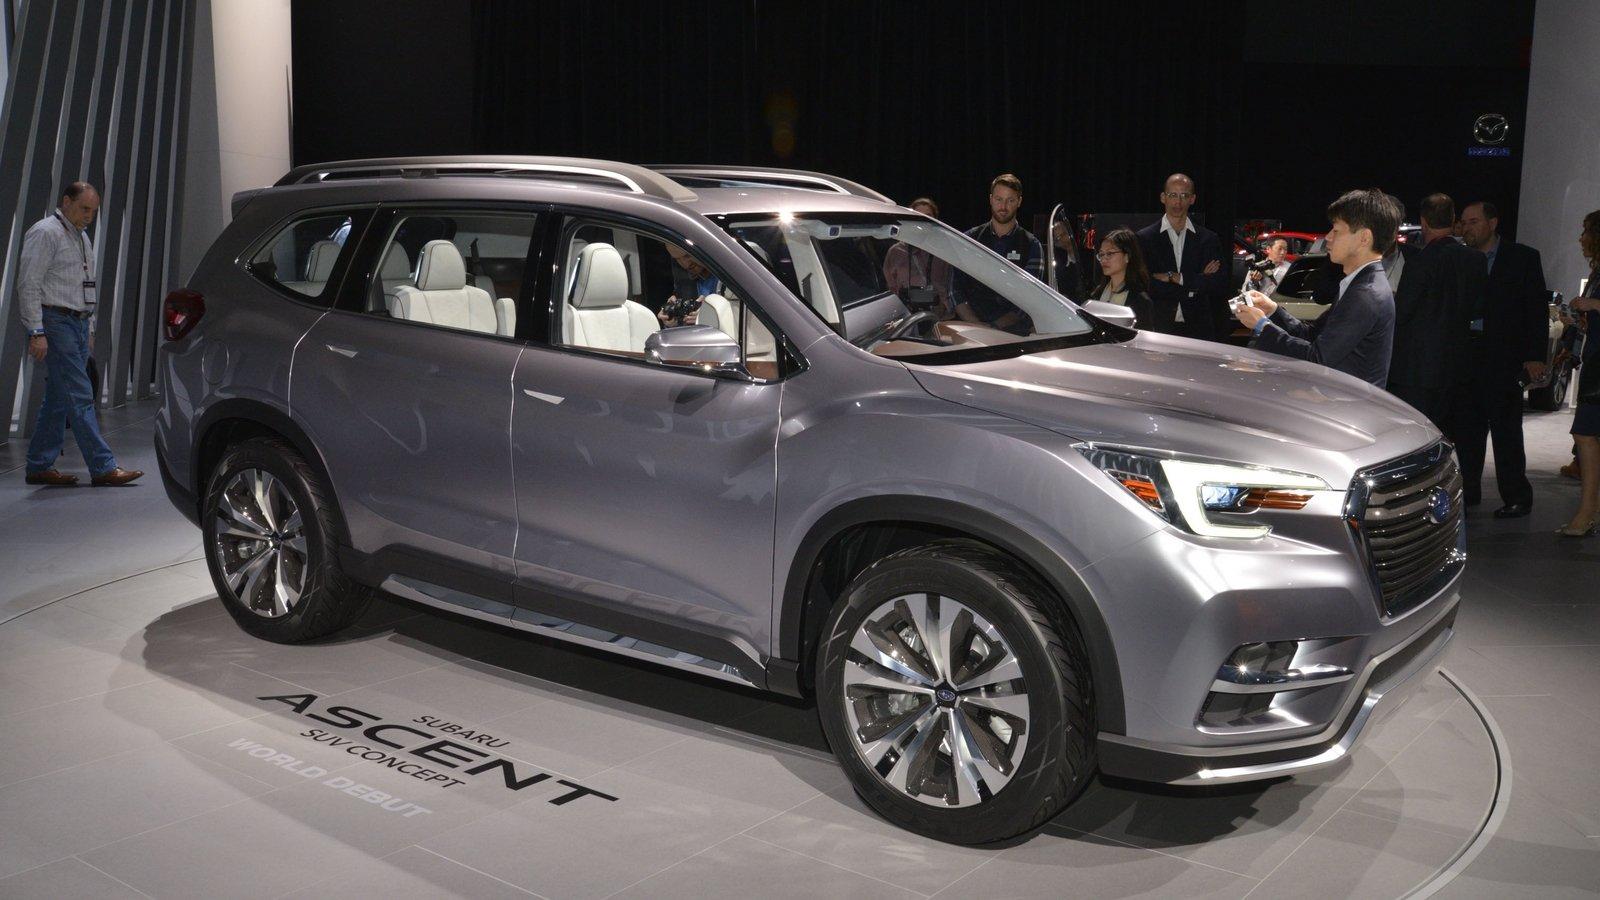 Subaru Neuheiten 2018 >> سوبارو اسنت 2018 الاختبارية | المرسال